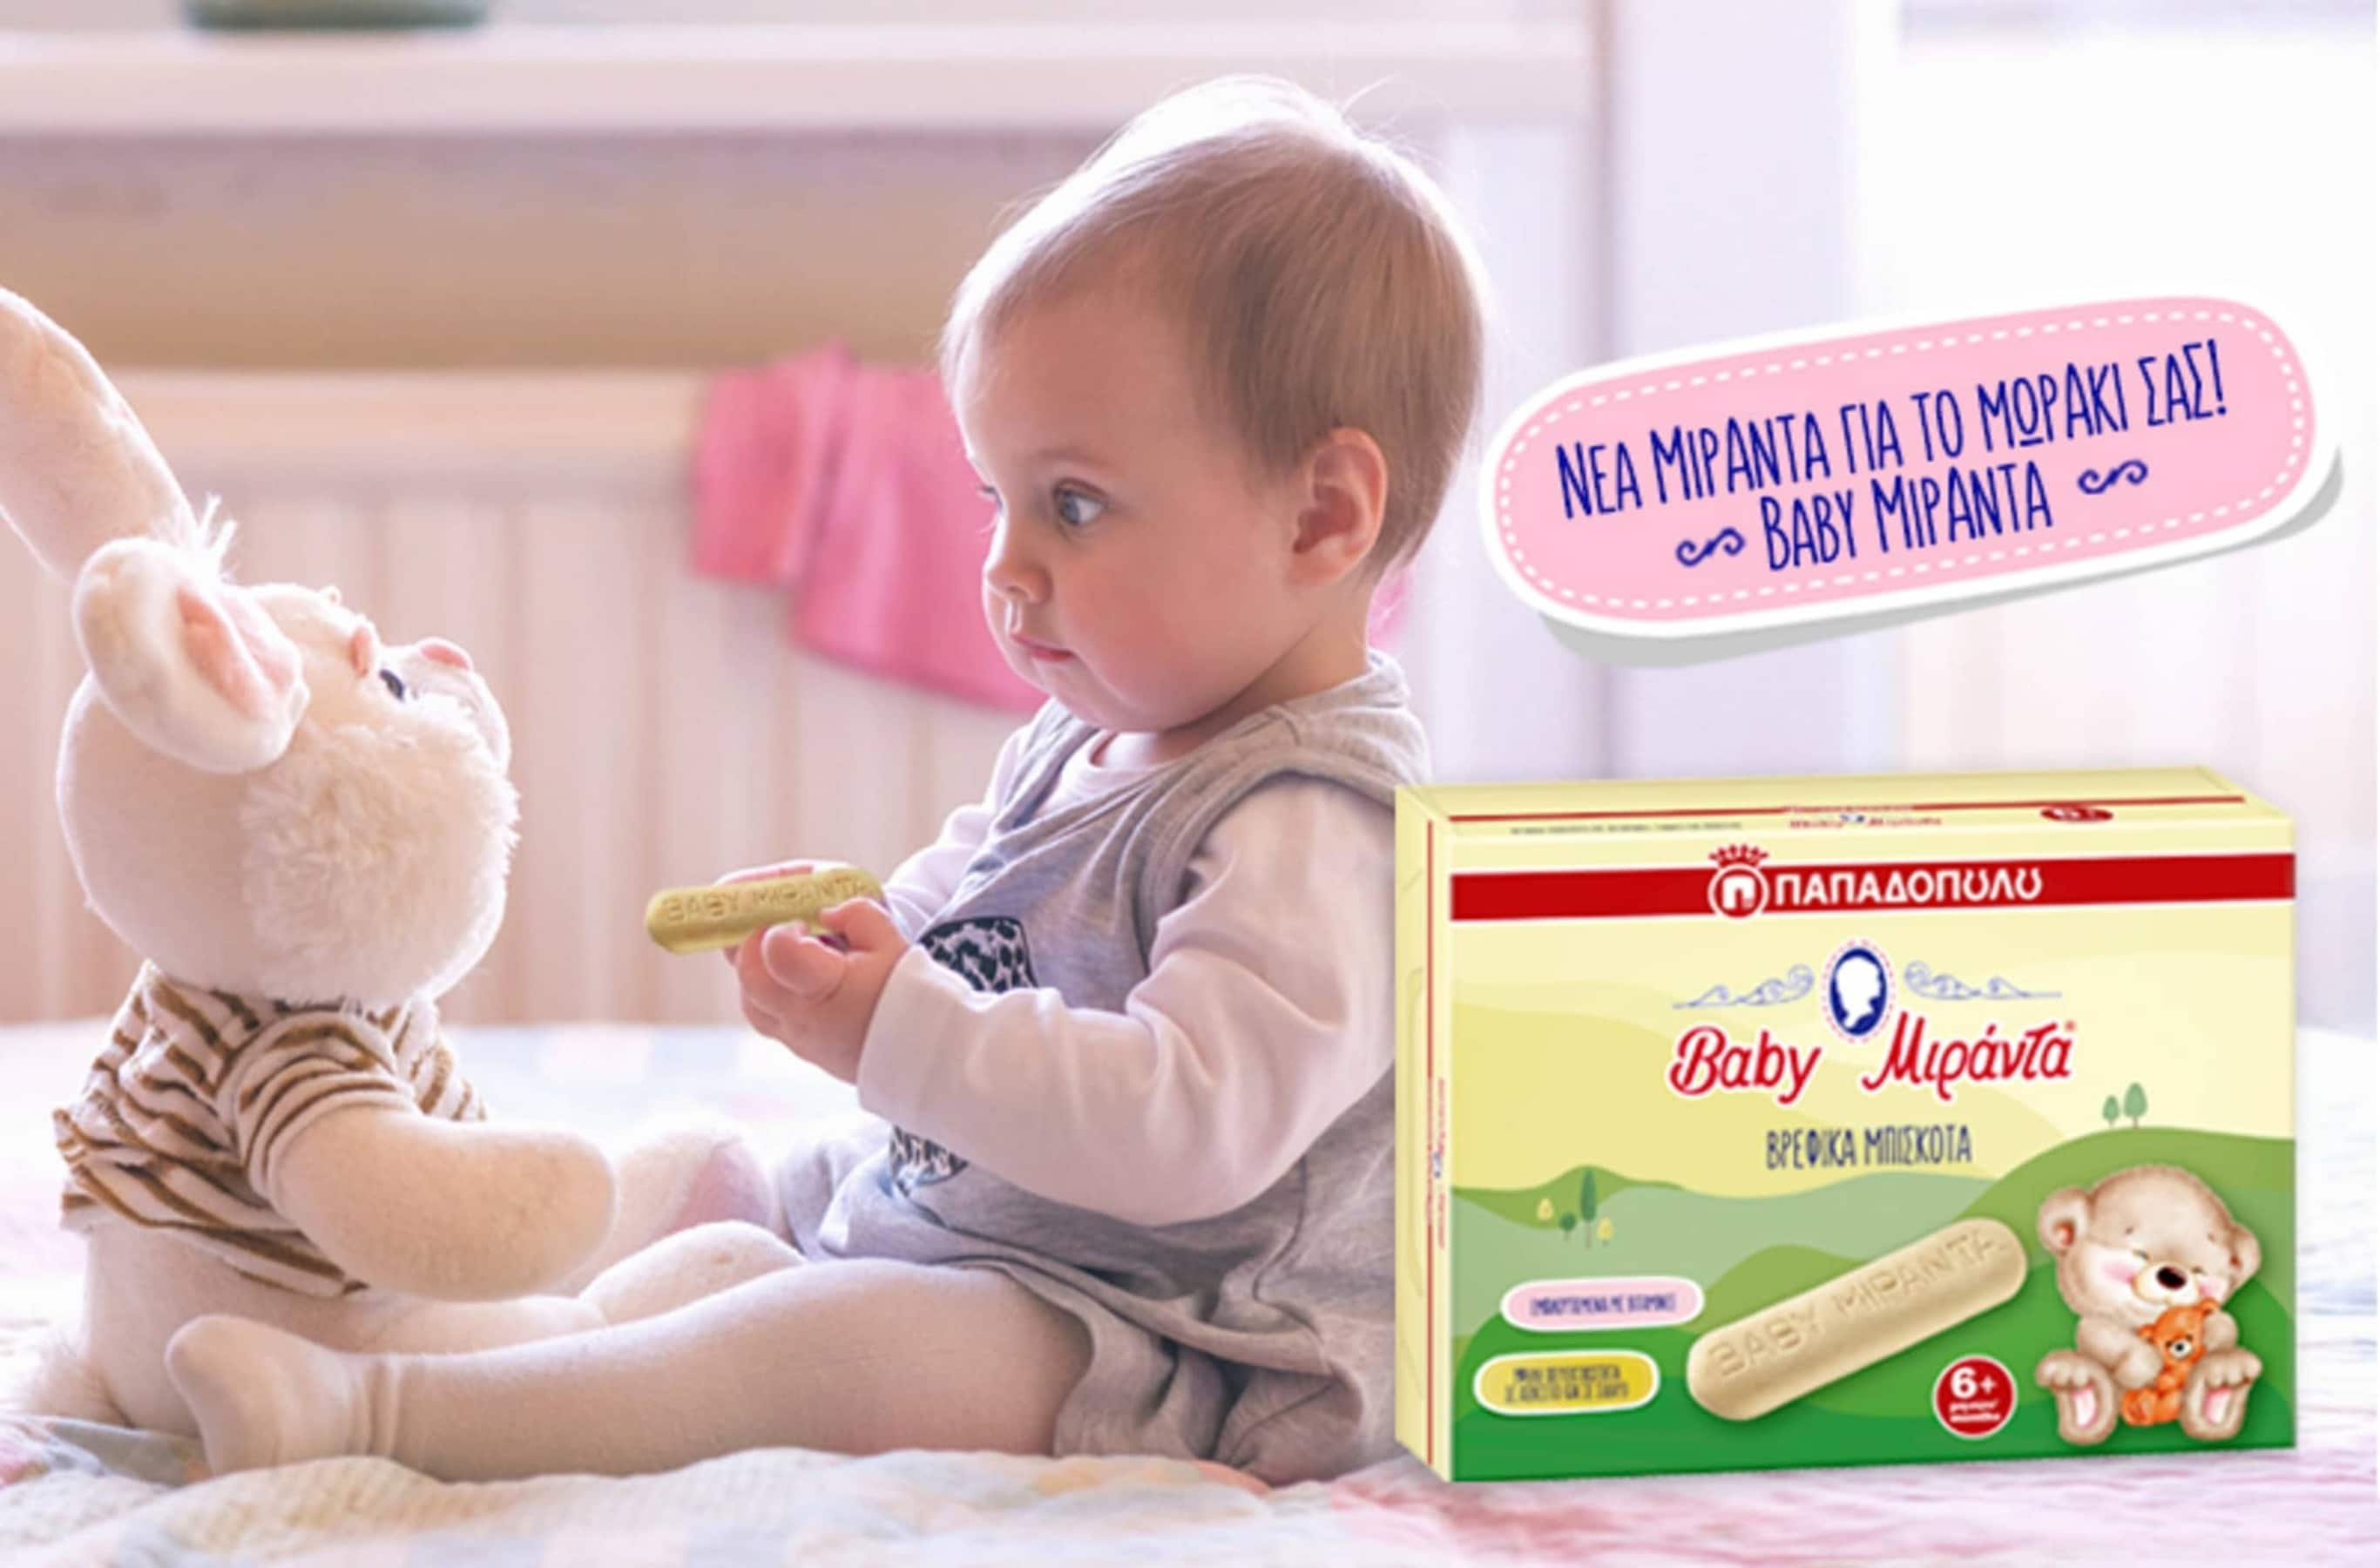 Featured image for Νέα Μιράντα για το μωράκι σας: Baby Μιράντα!